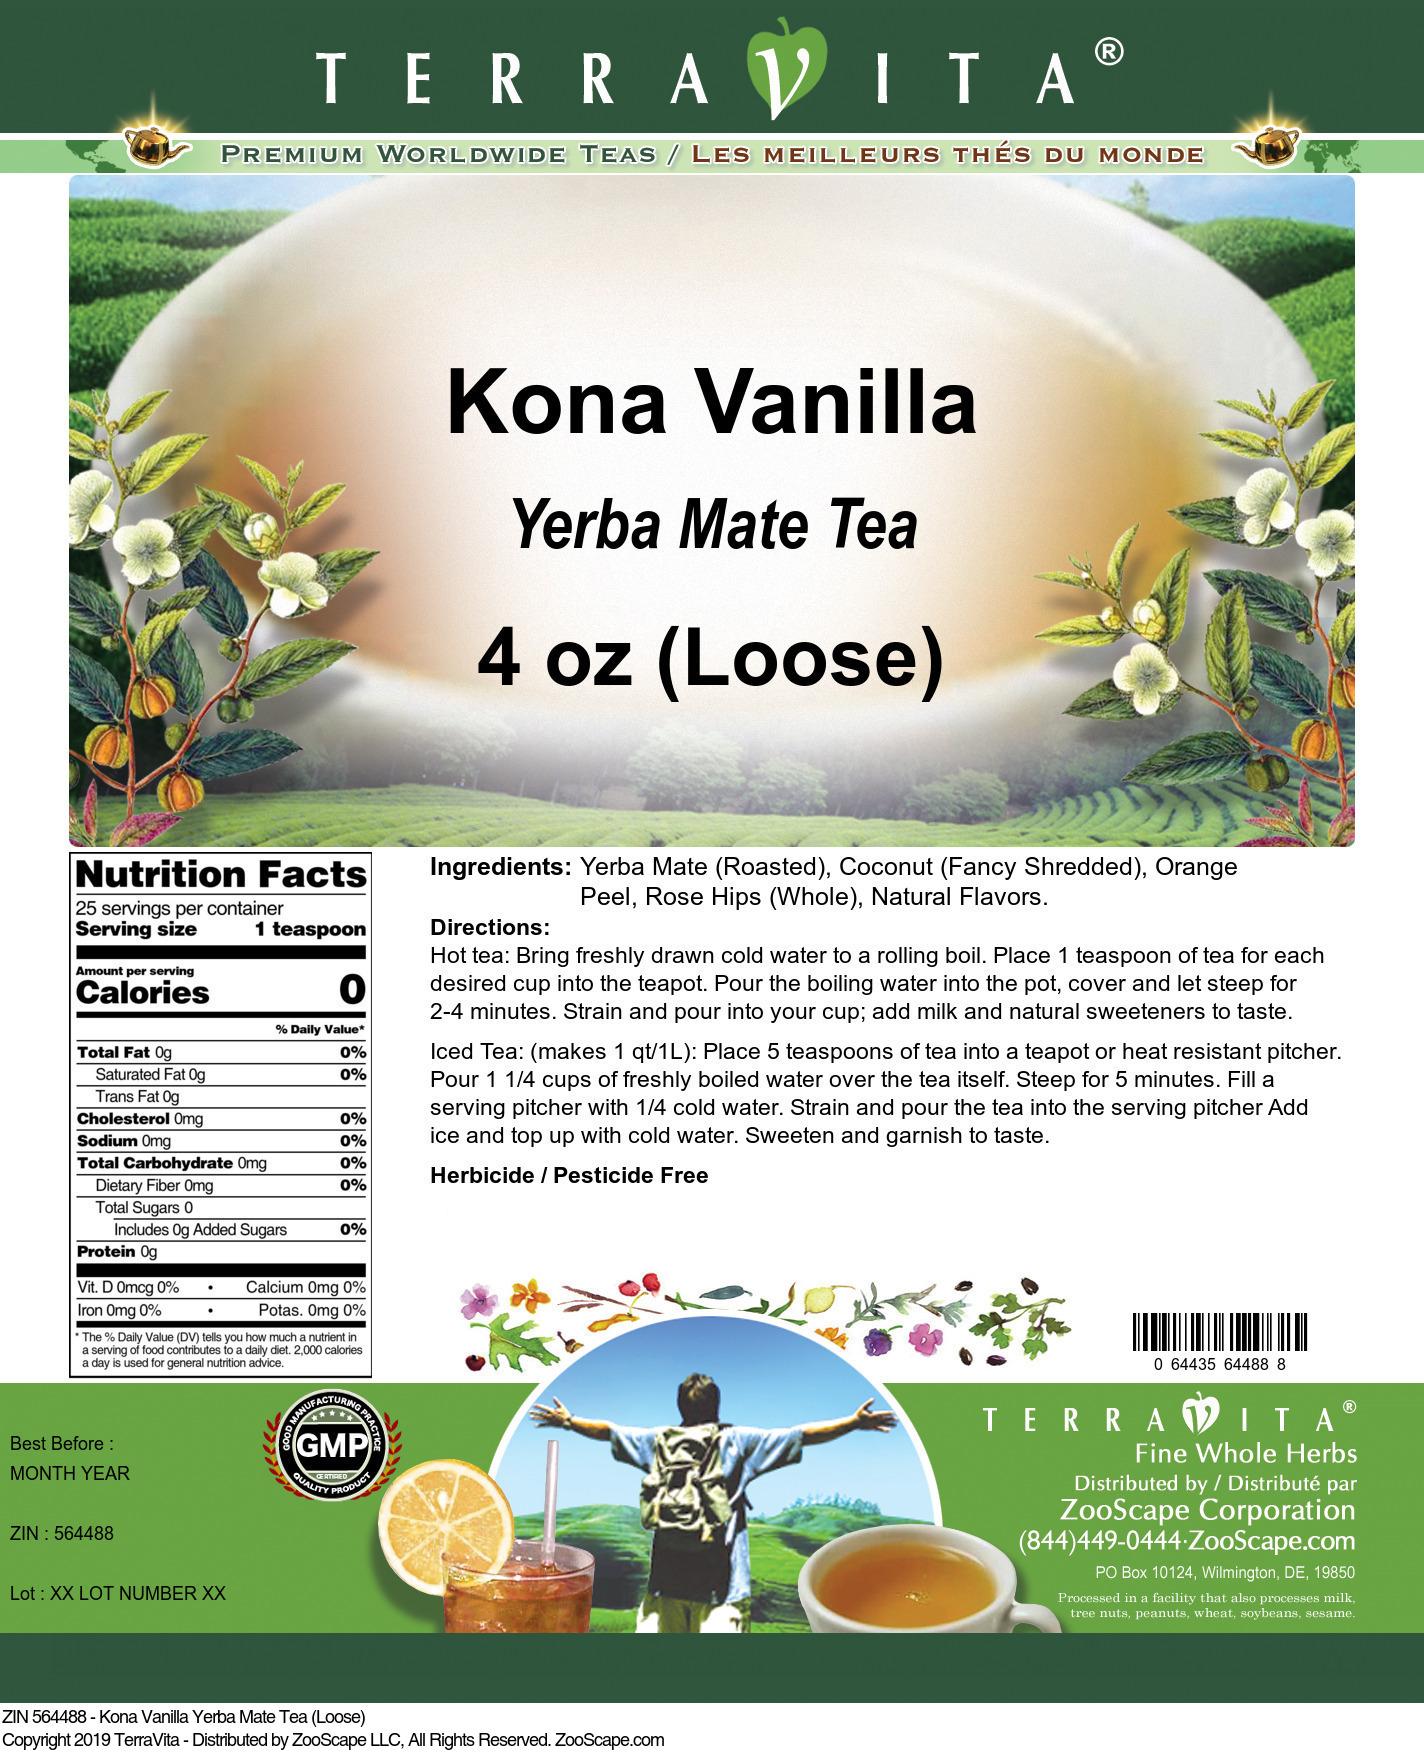 Kona Vanilla Yerba Mate Tea (Loose)